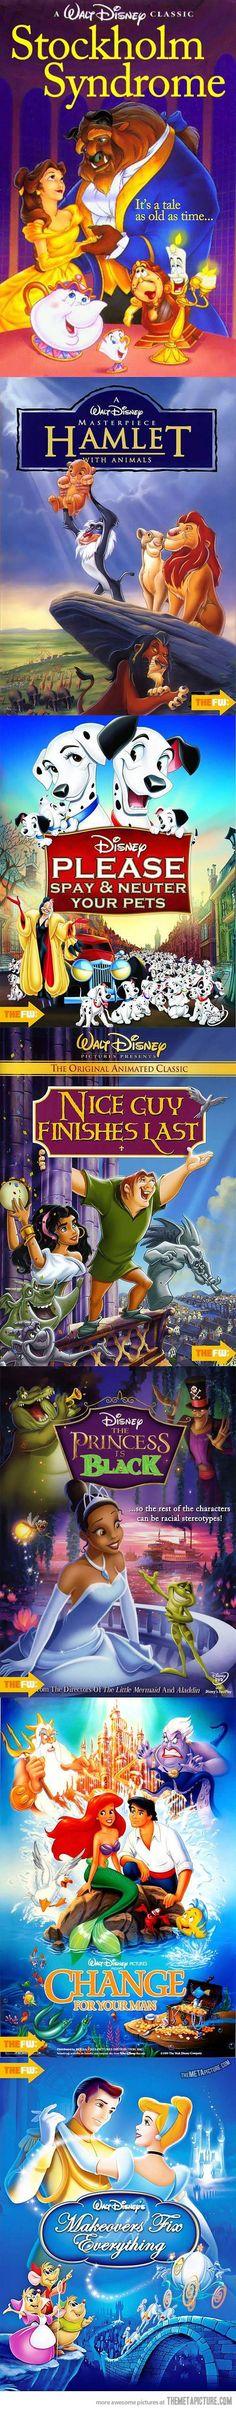 If Disney films had honest titles - doesn't stop me loving them!